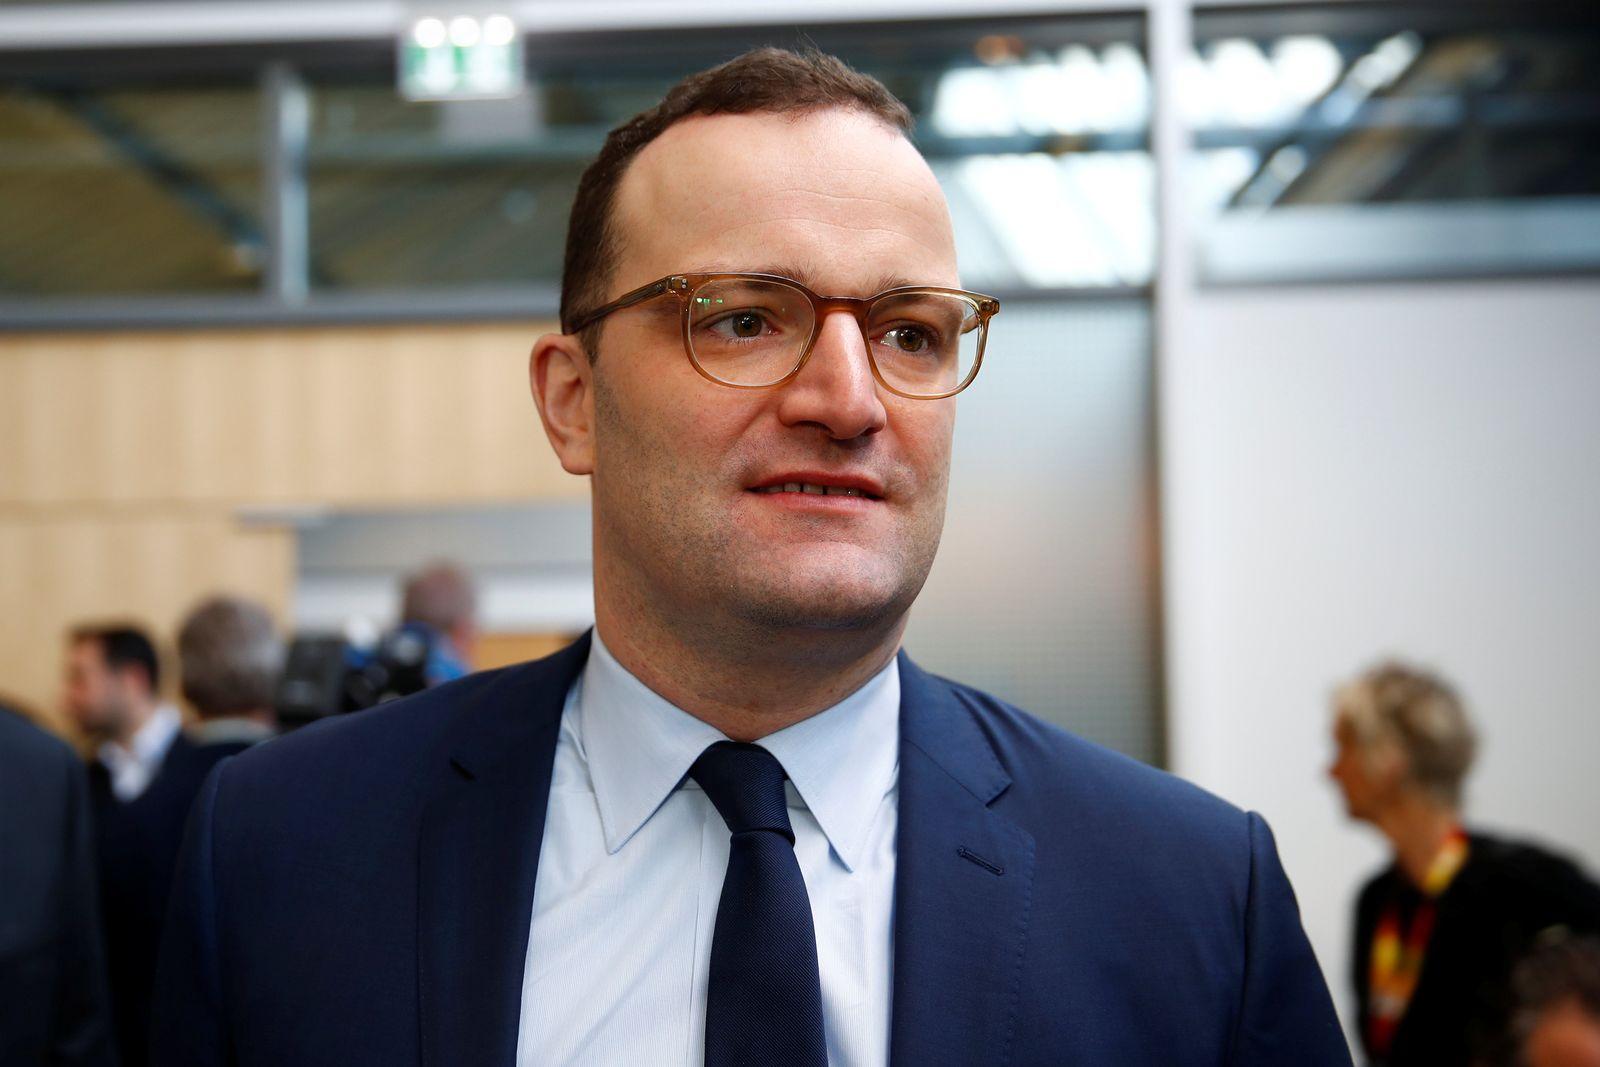 GERMANY-POLITICS/CDU